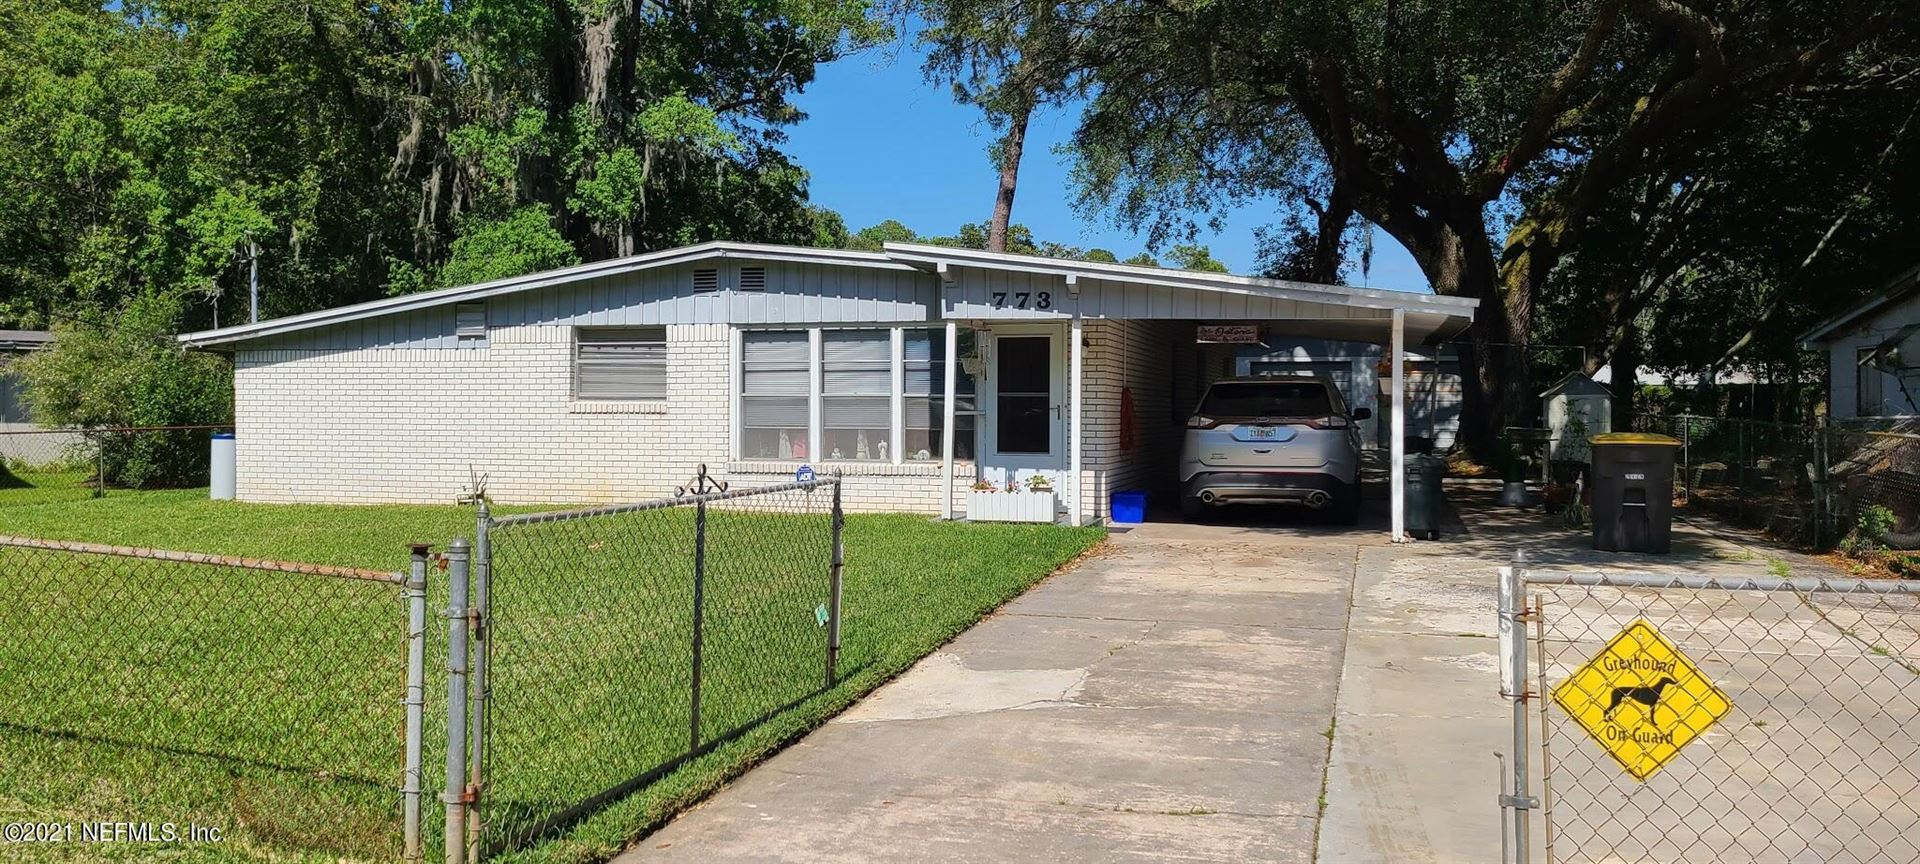 773 LE BRUN DR, Jacksonville, FL 32205 - MLS#: 1106917